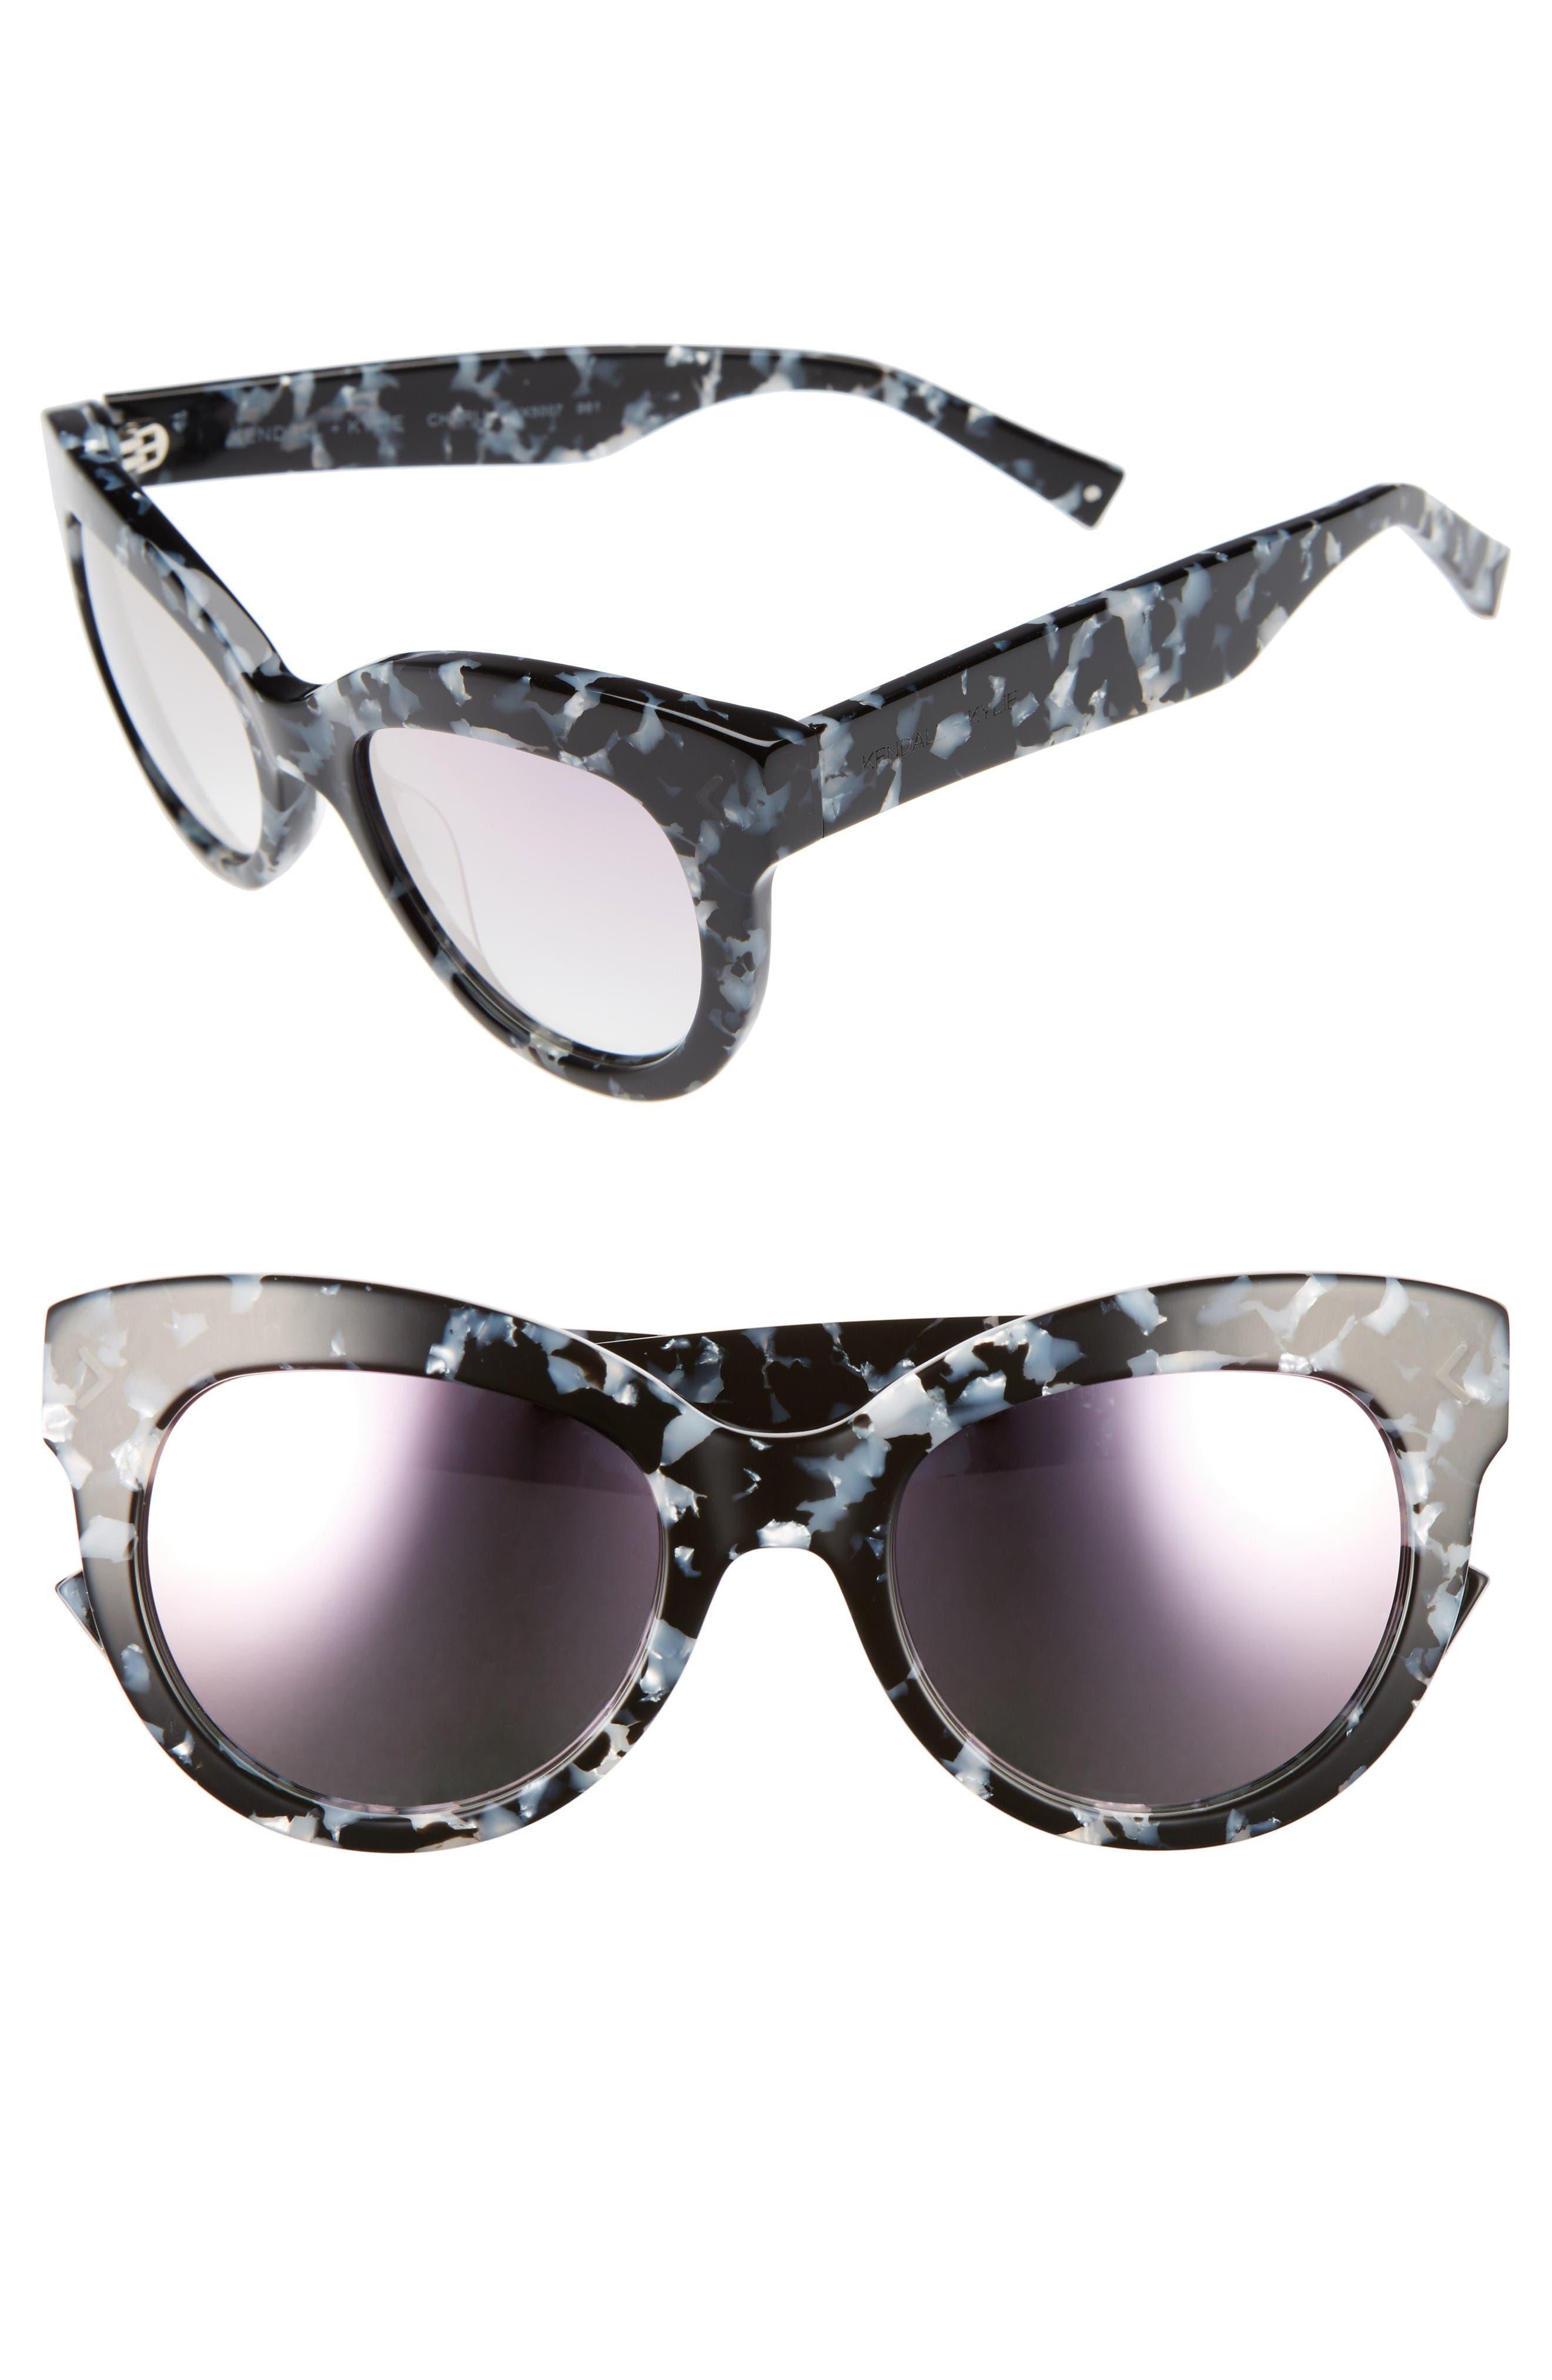 Main Image - KENDALL + KYLIE Charli 52mm Cat Eye Sunglasses